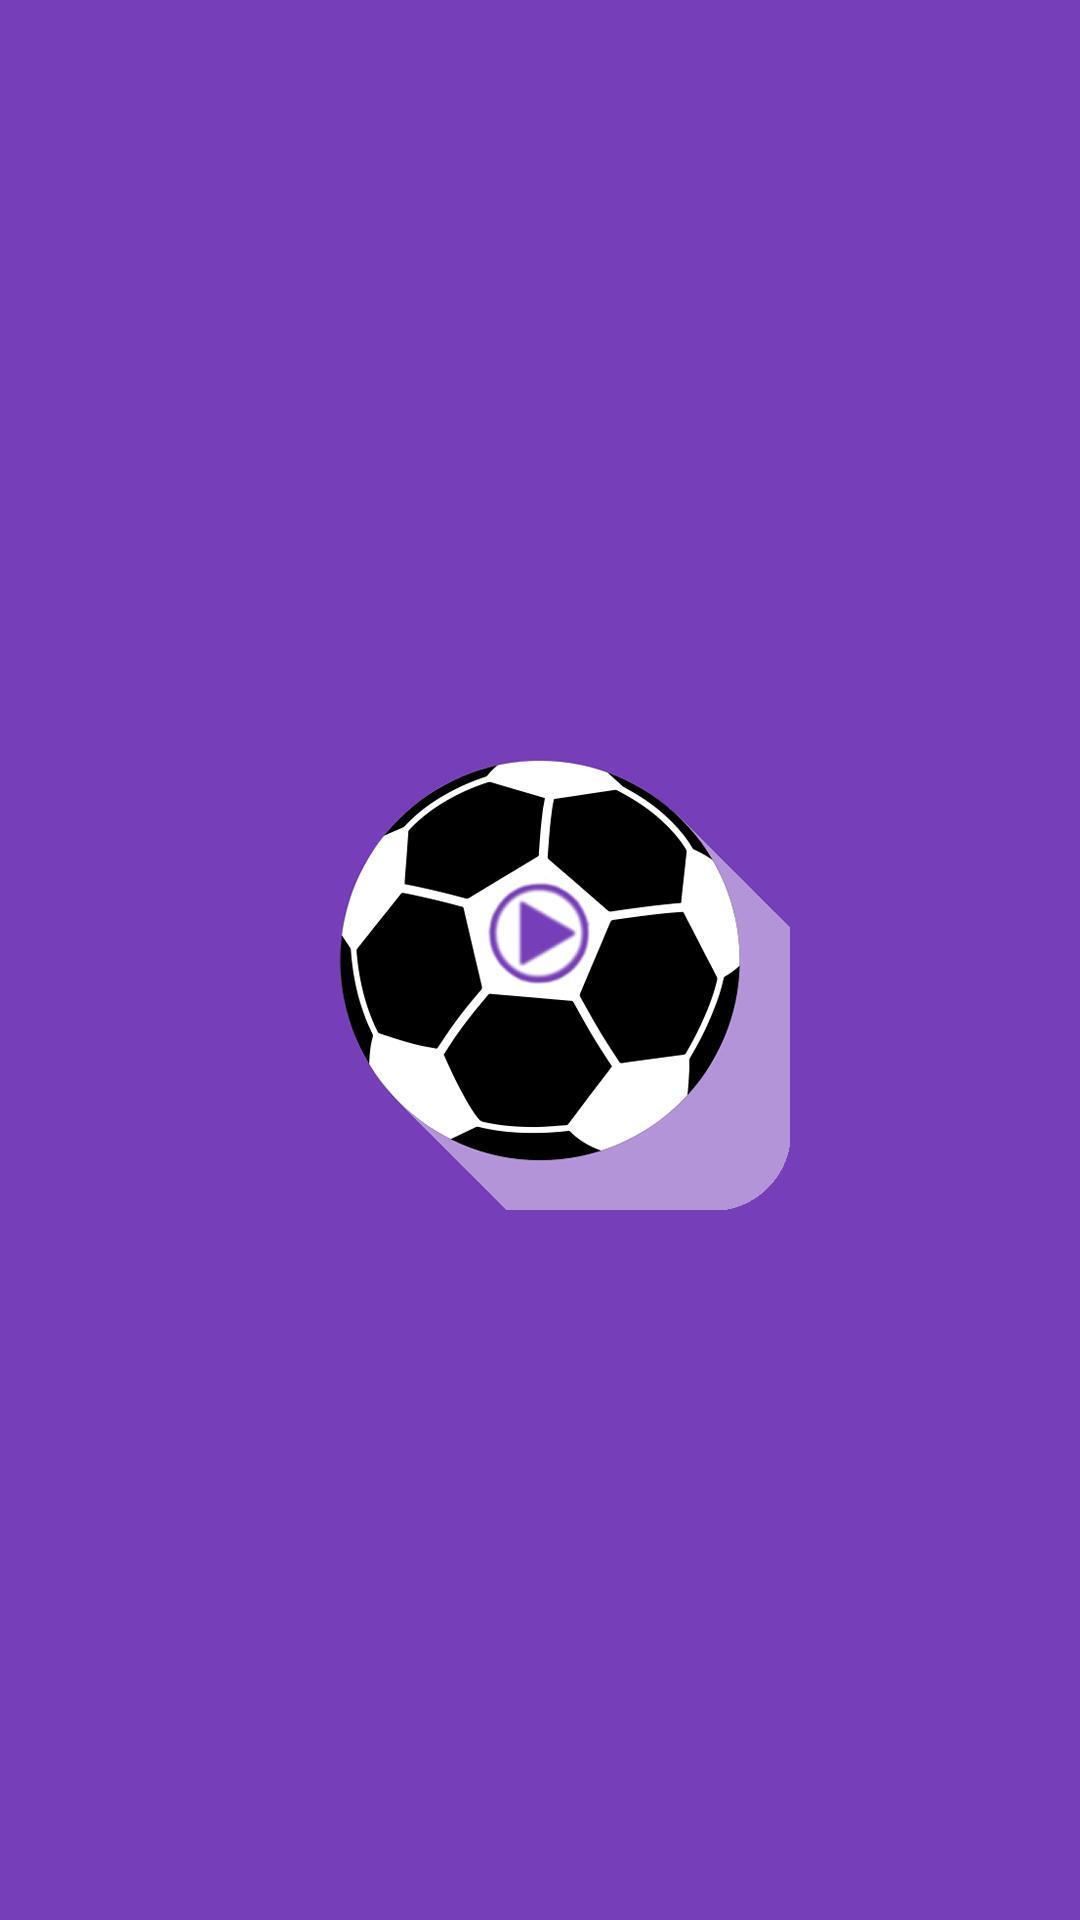 Calcio Tv Streaming Diretta For Android Apk Download